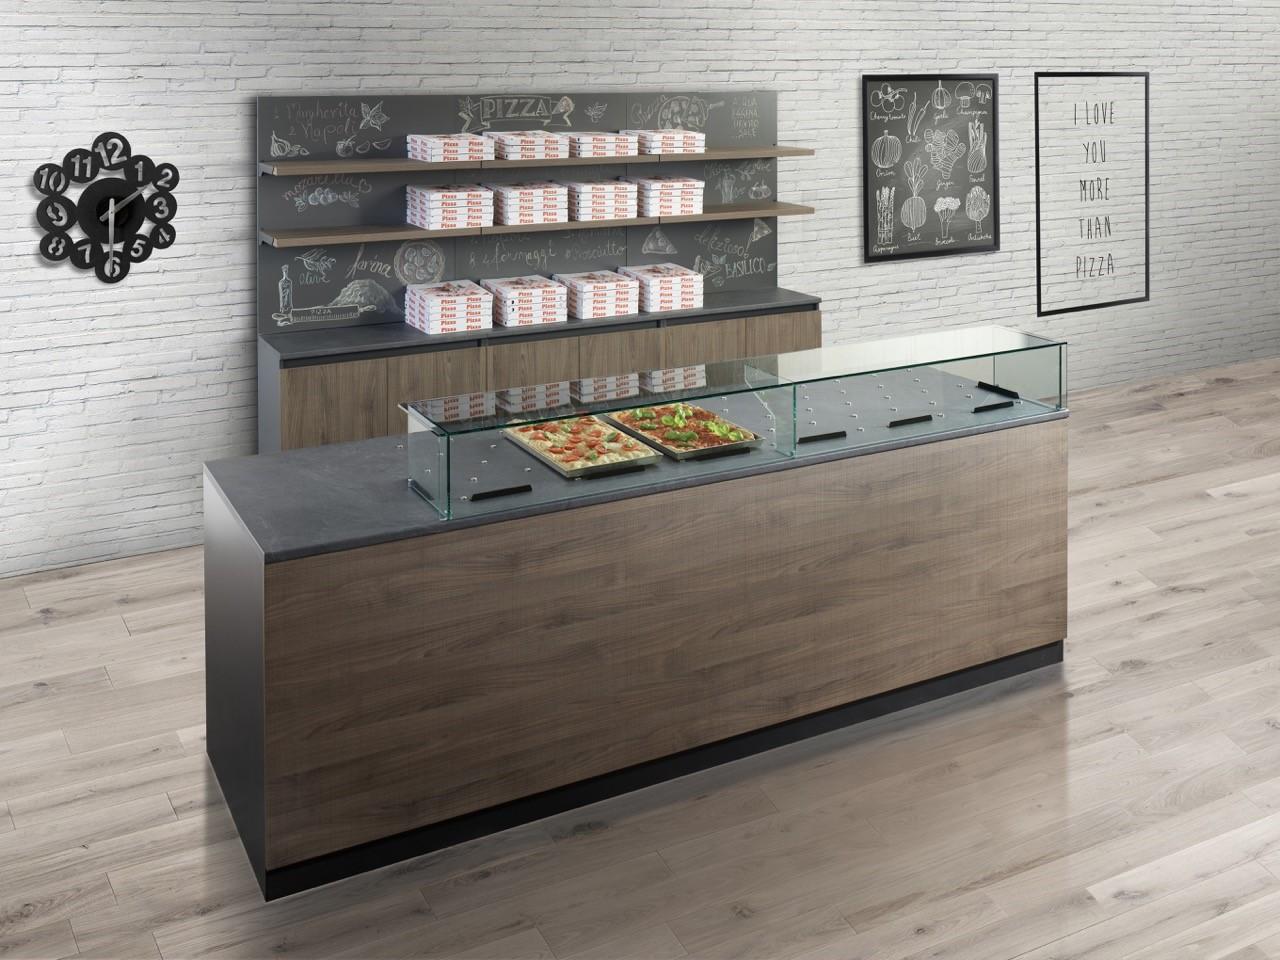 bakerycafe proposta bar - arredamento pizzeria low cost - Arredamento Moderno Per Pizzerie